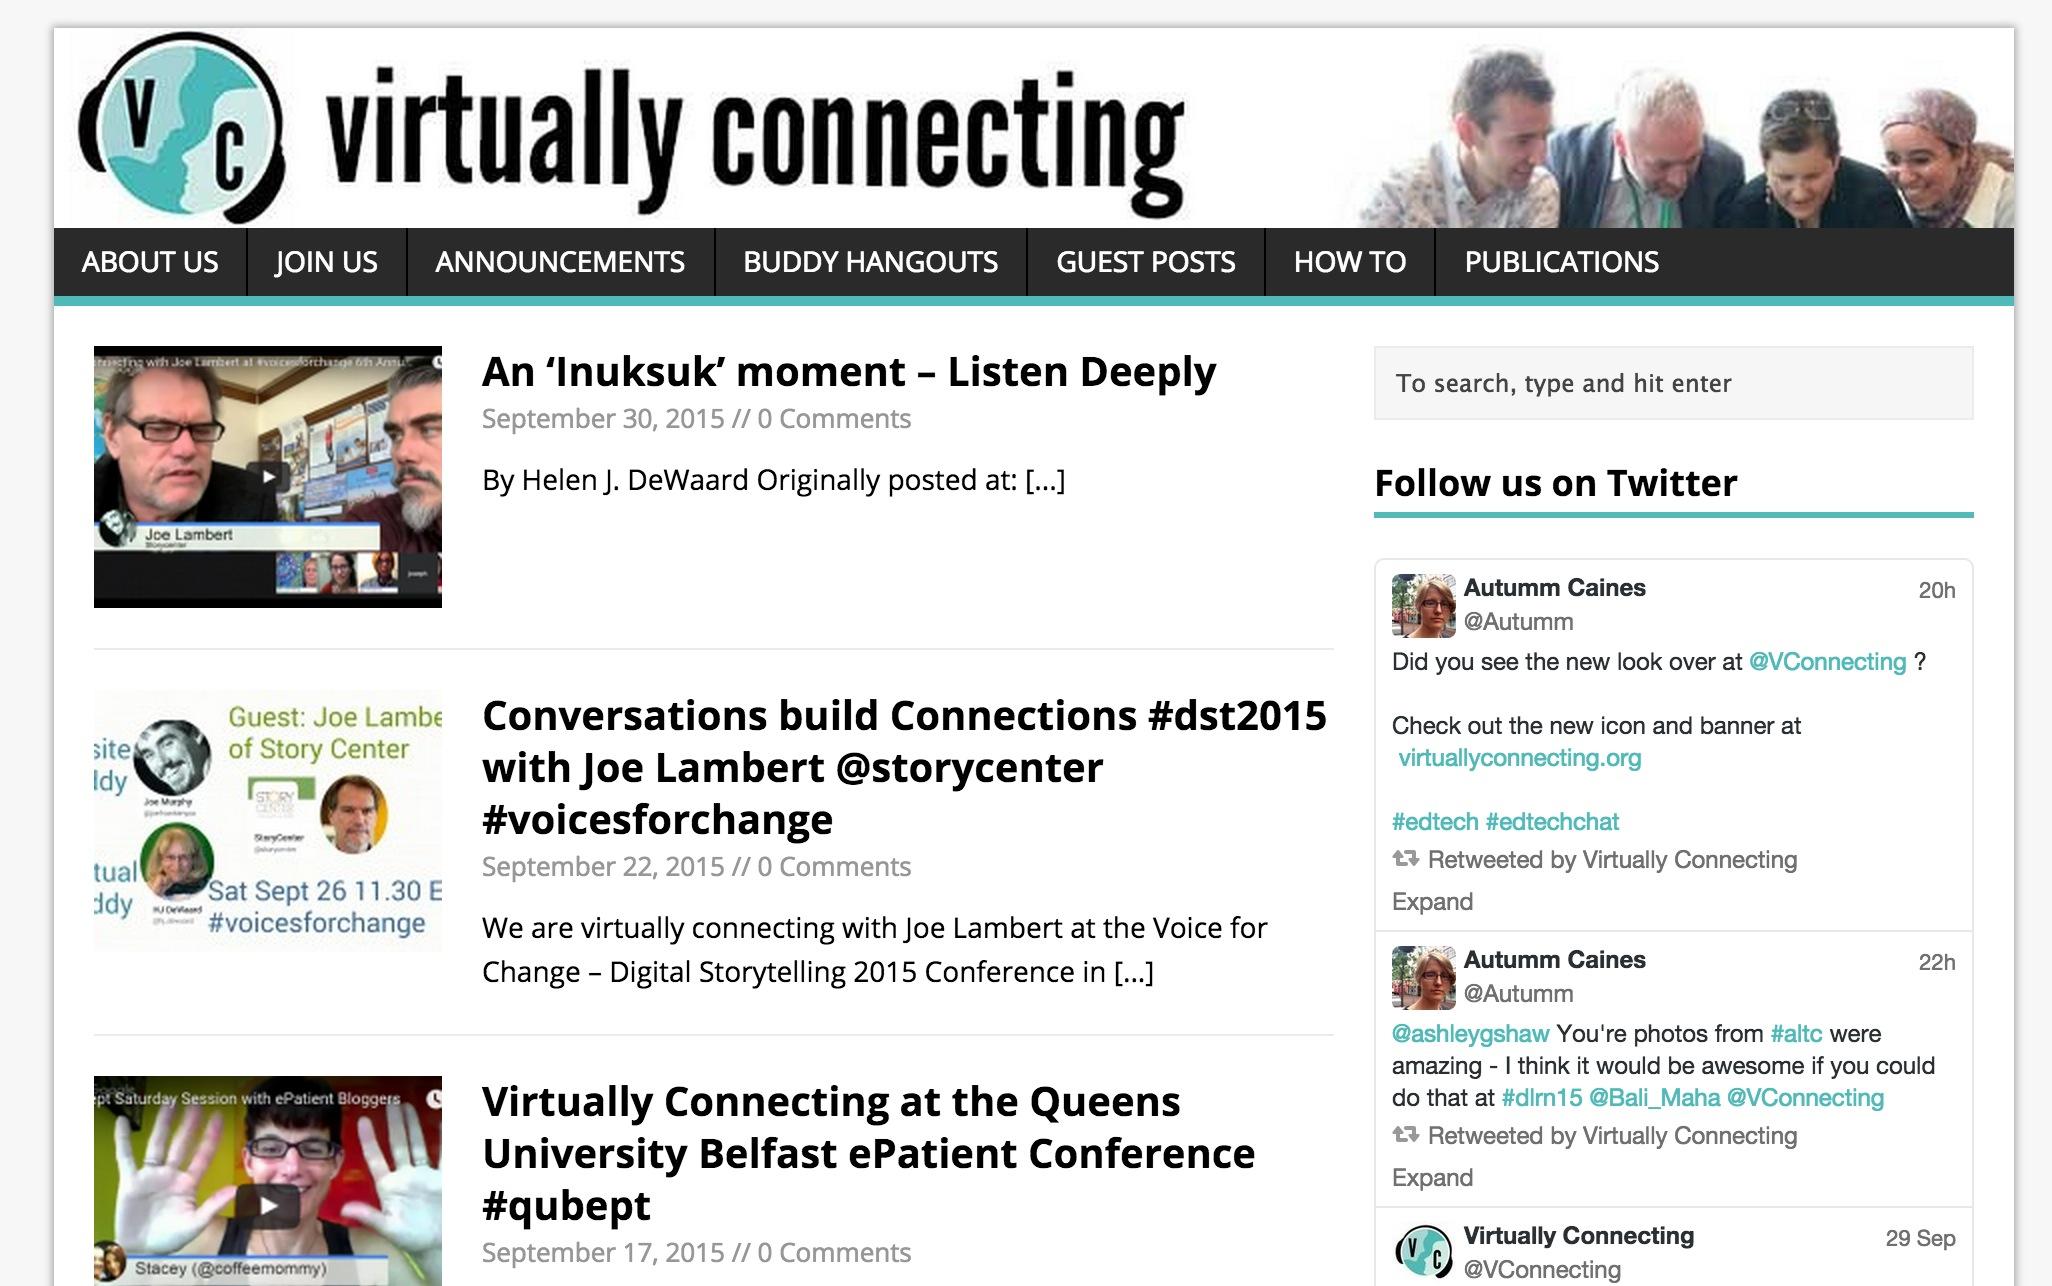 Http Cogdogblog Com 2015 10 Refining The Virtually Connecting Site